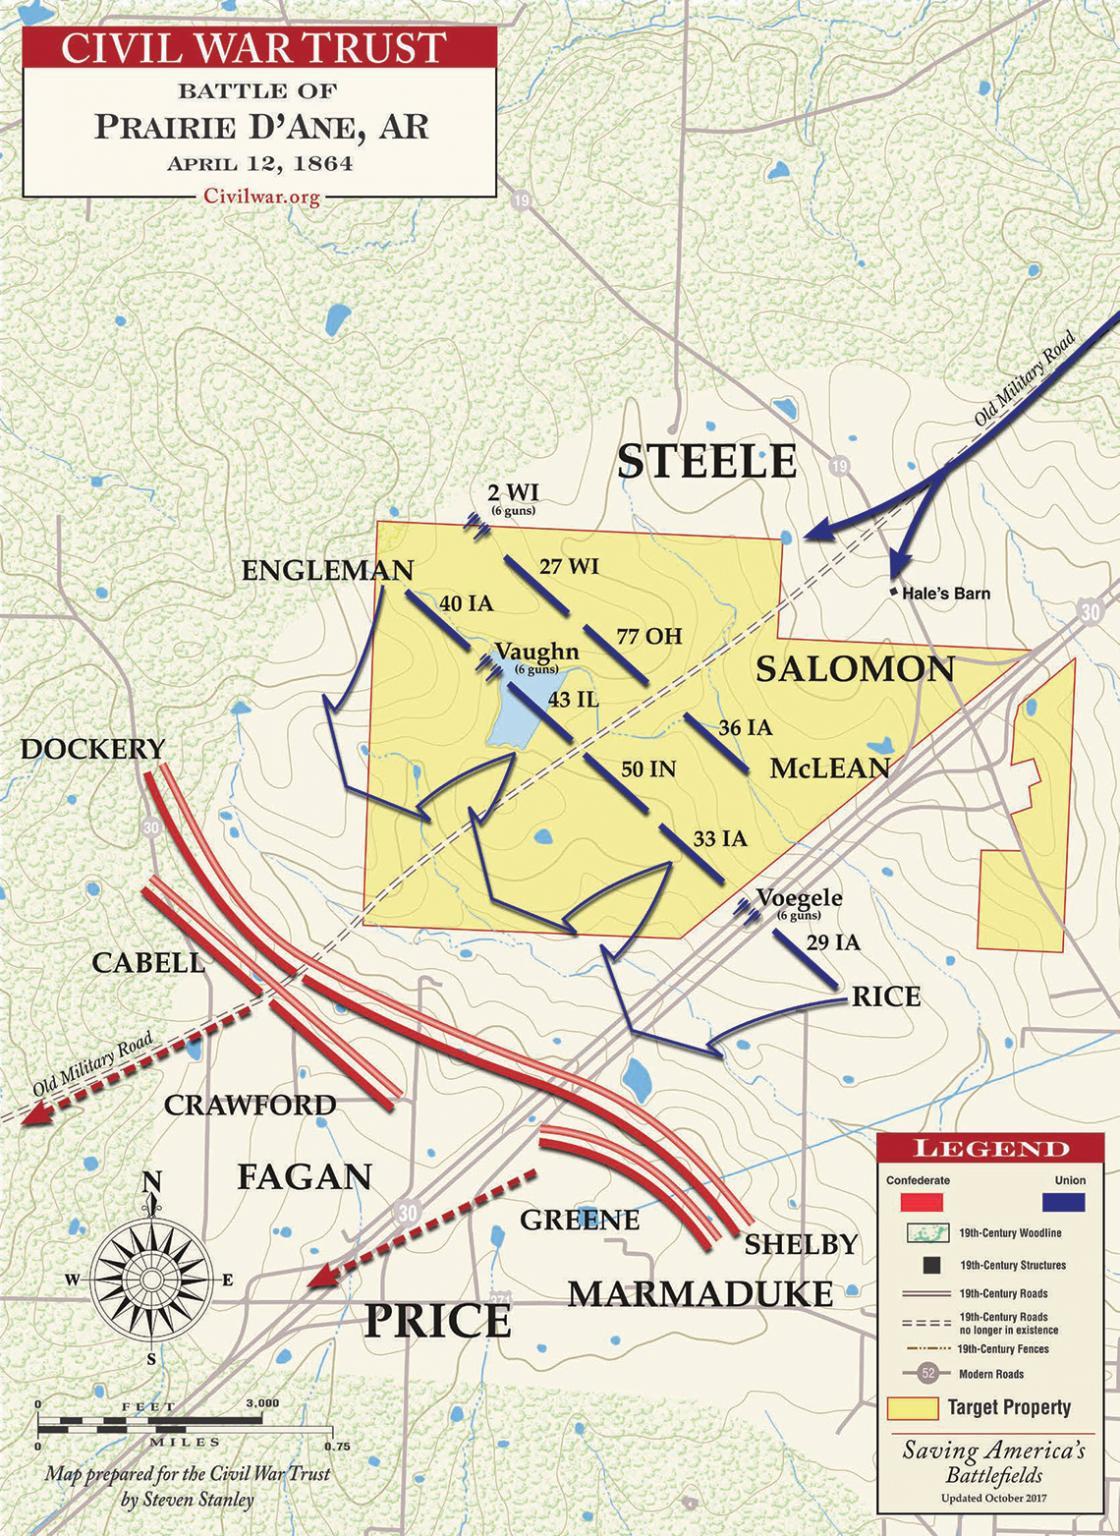 Prairie D'Ane - April 12, 1864